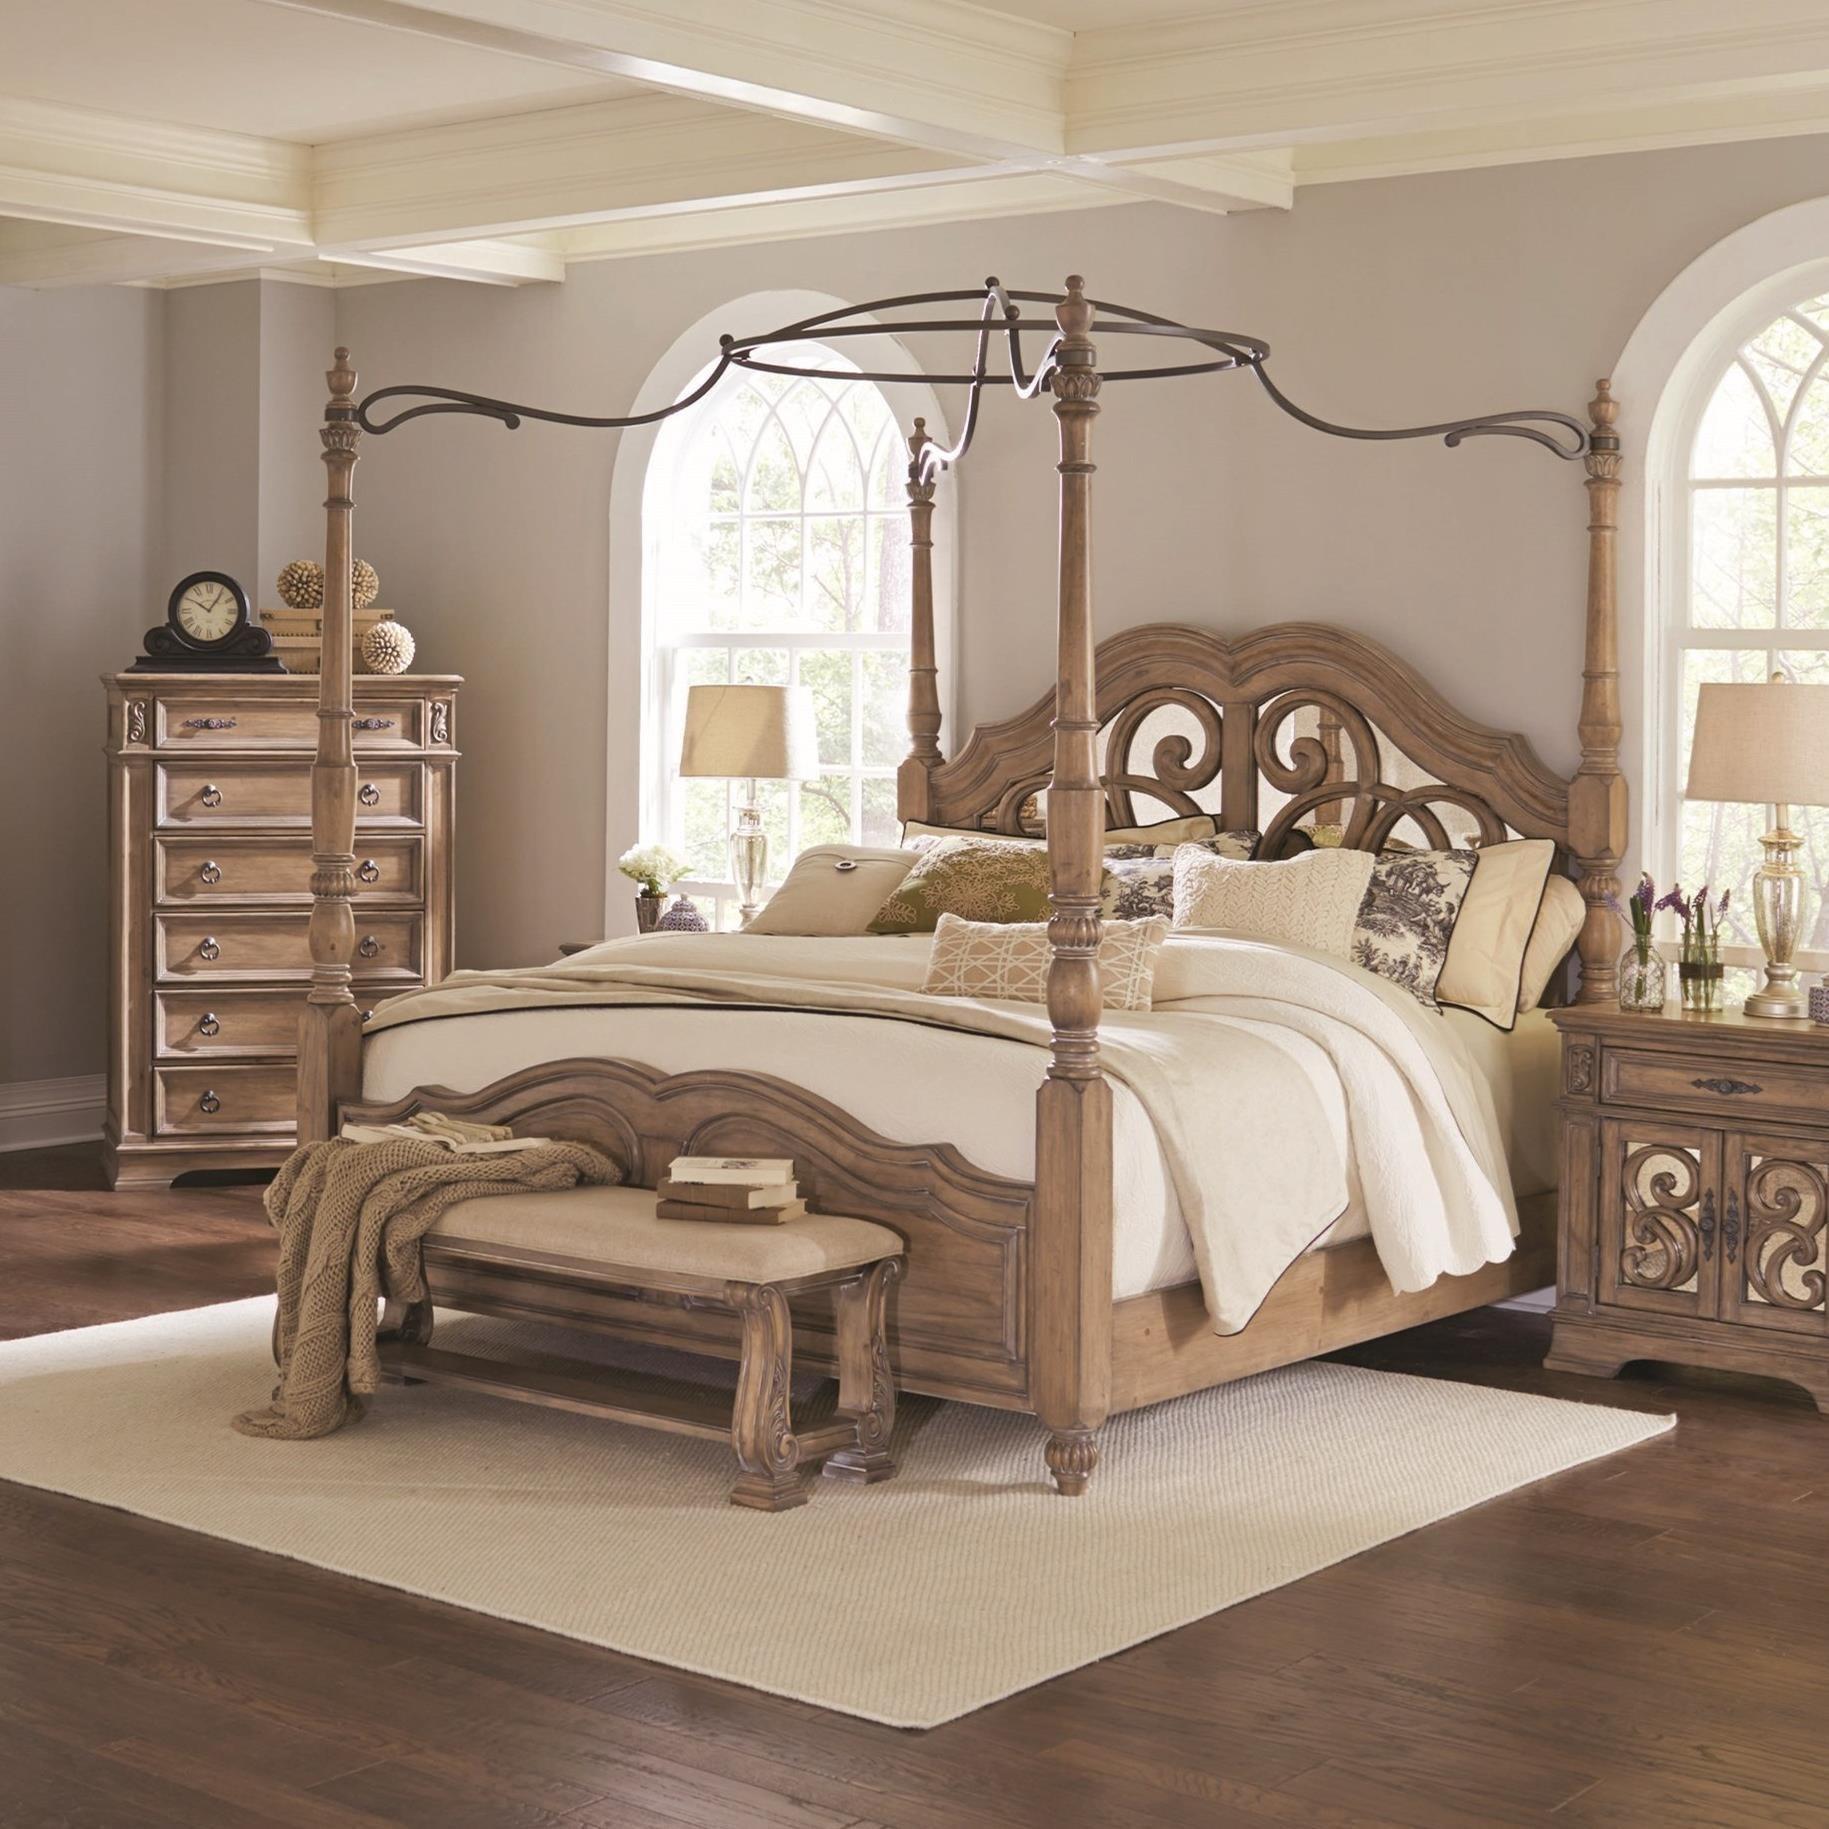 Coaster Ilana Queen Canopy Bed with Mirror Back Headboard